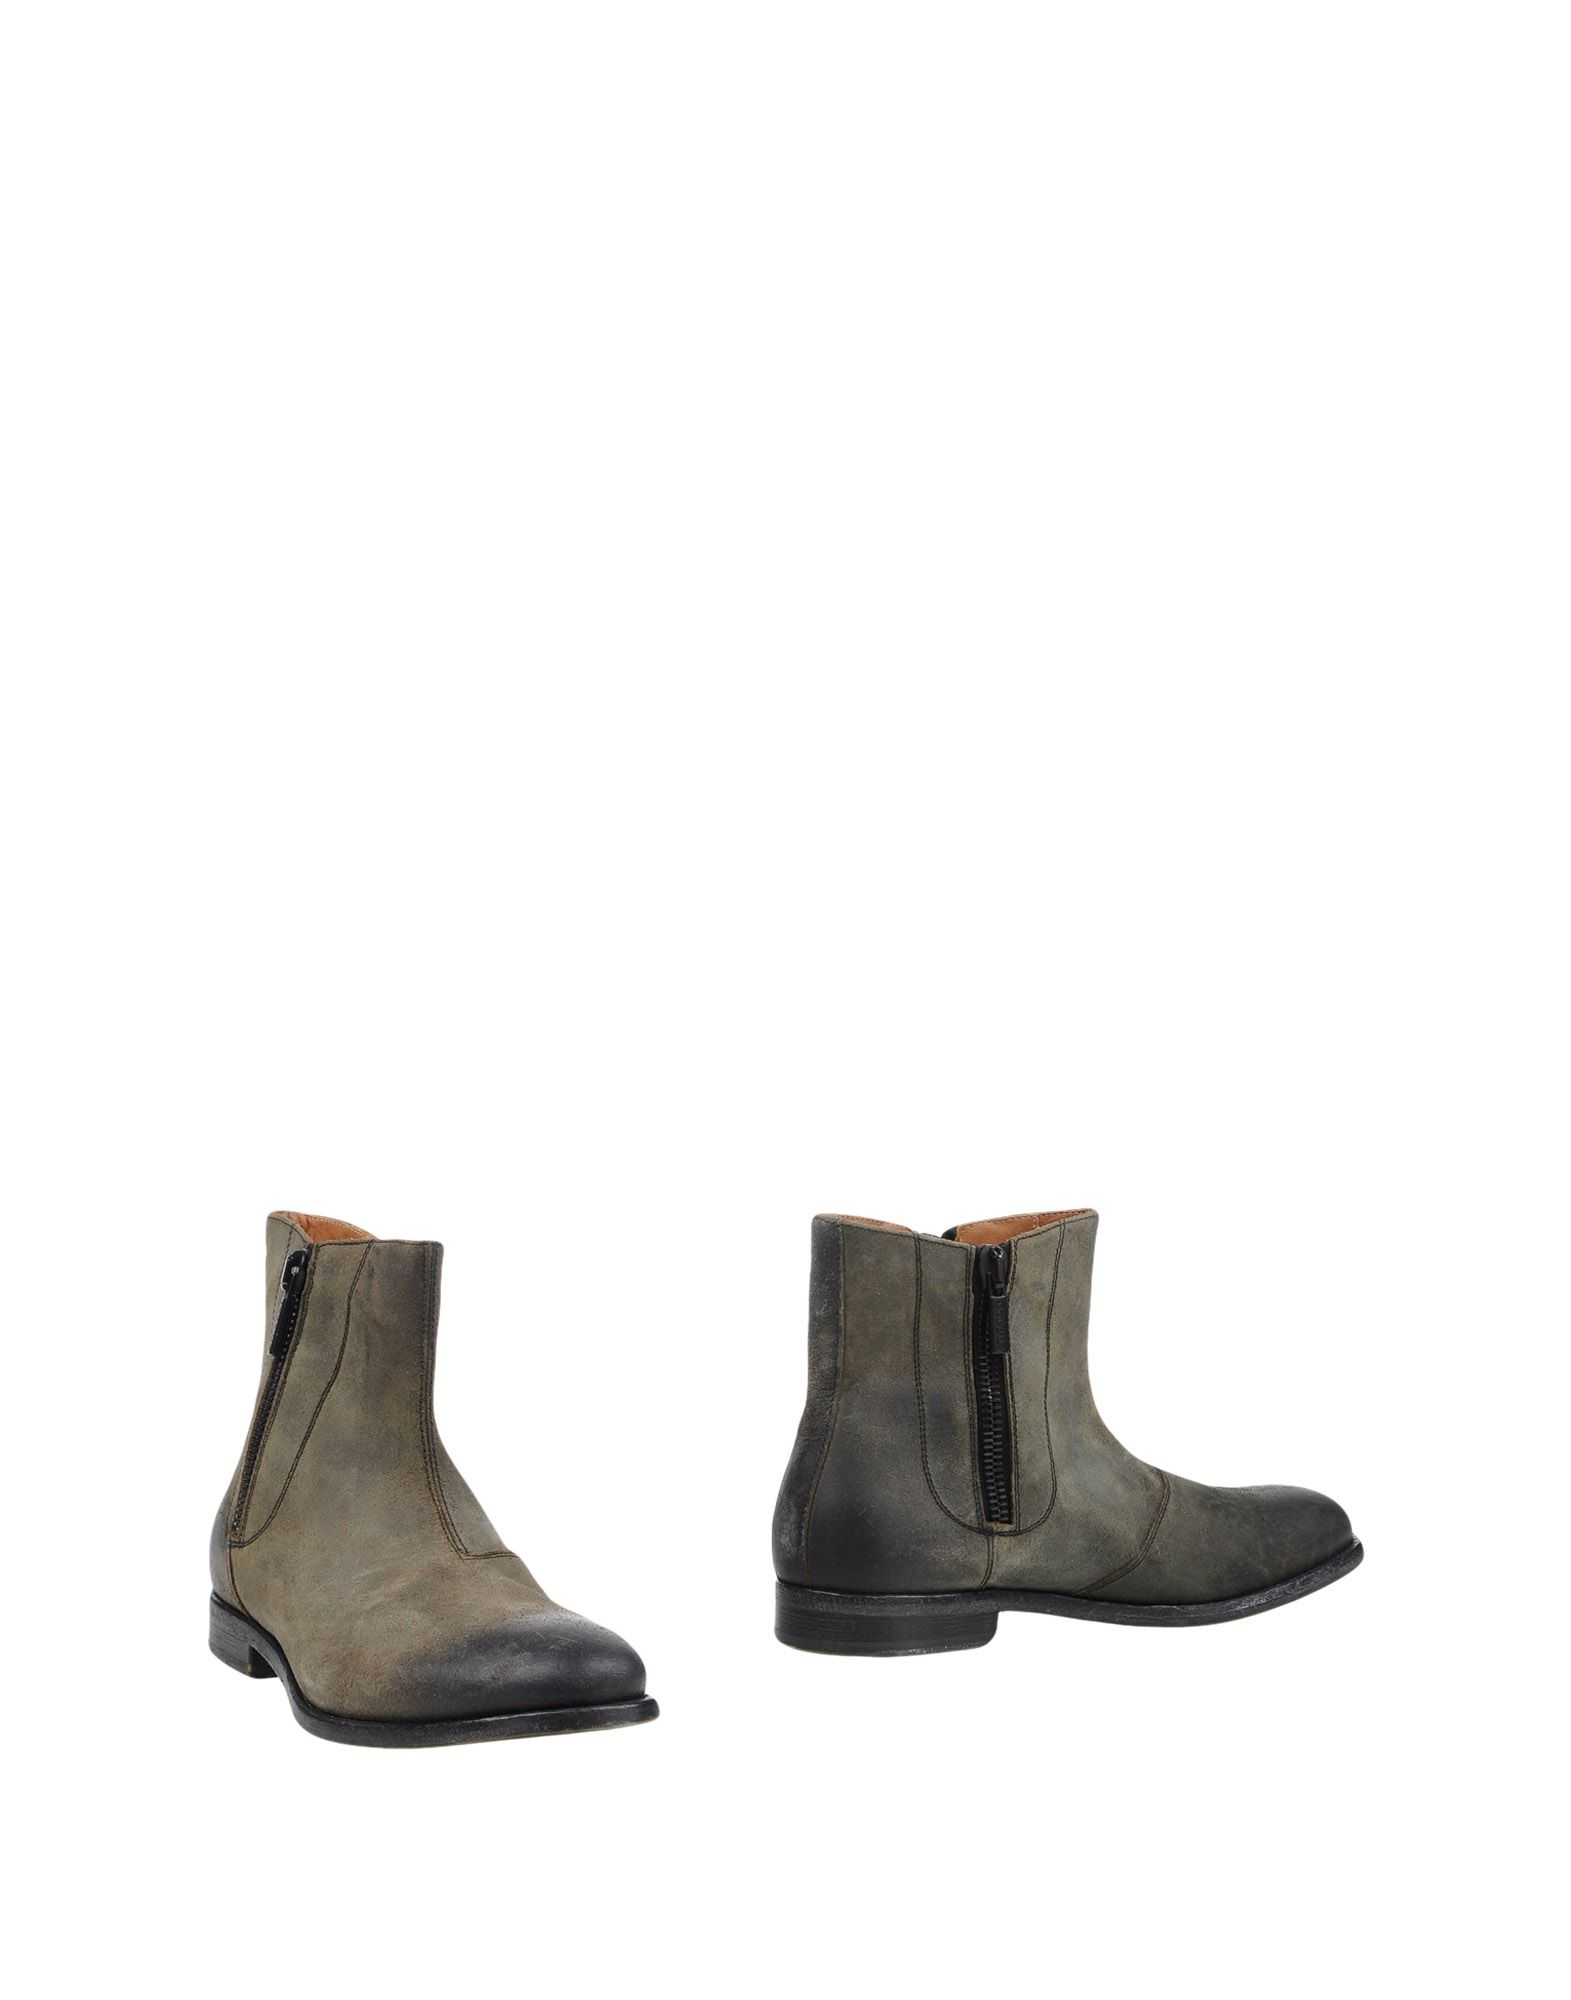 Doucal's Stiefelette Schuhe Herren  11363628HG Heiße Schuhe Stiefelette 200e90